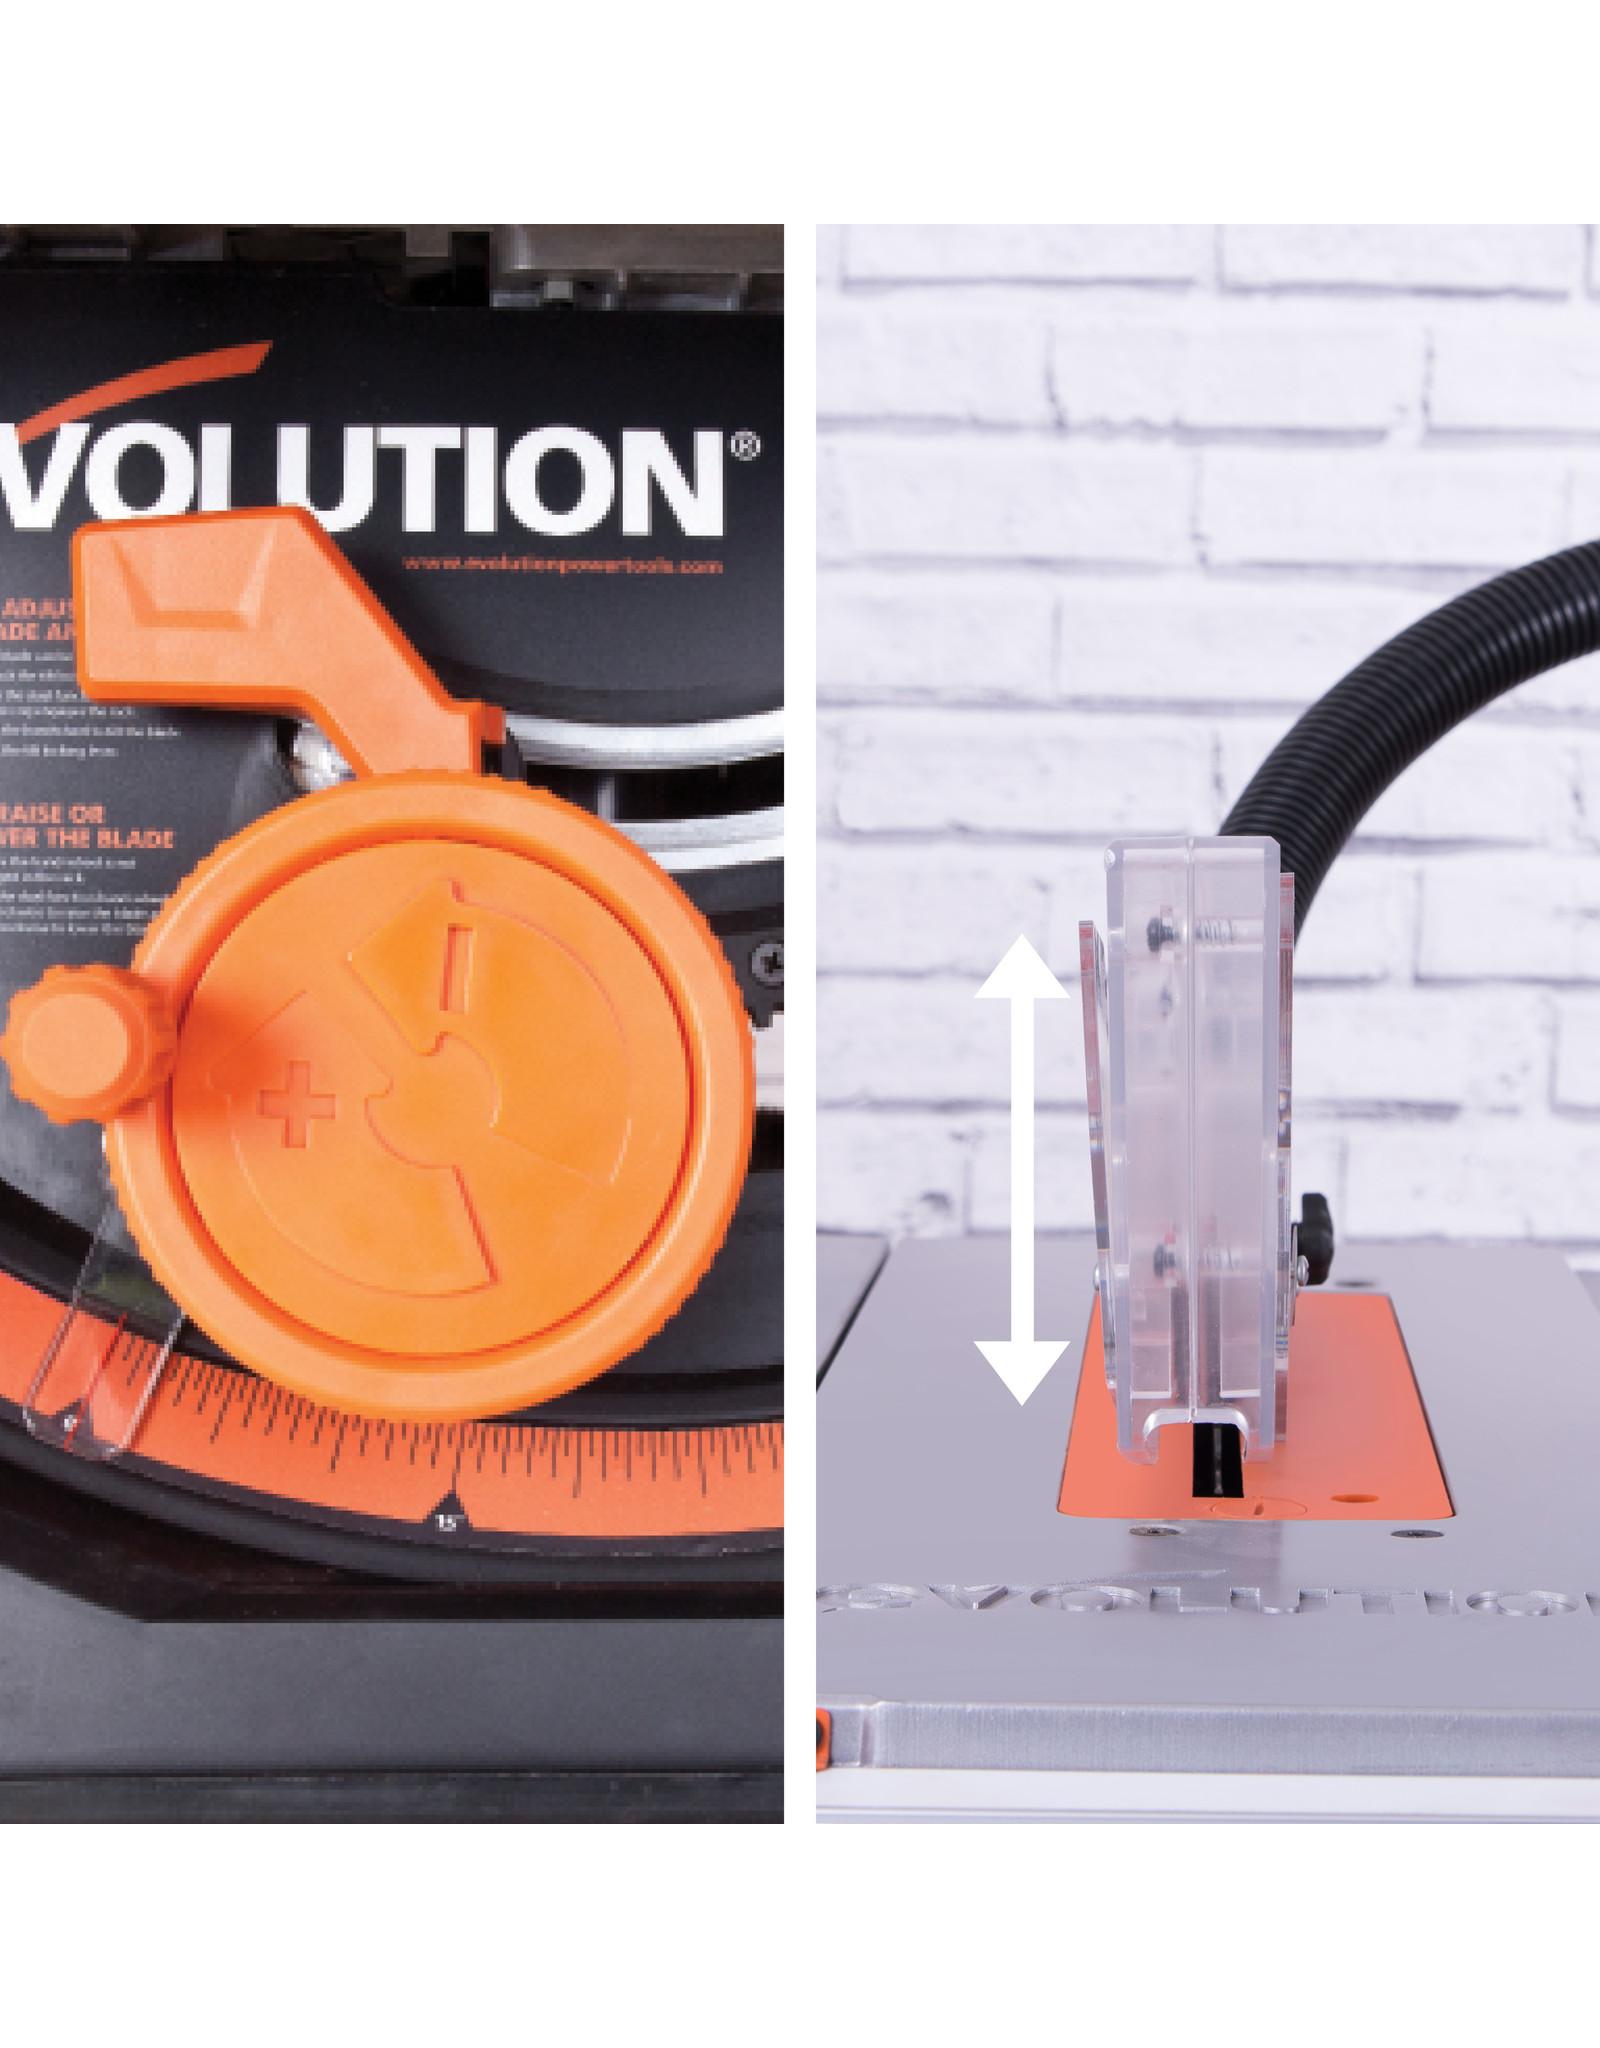 Evolution Power Tools Build Line MULTI-MATERIAL TISCHSÄGE RAGE 5-S +  1 GRATIS SÄGEBLATT